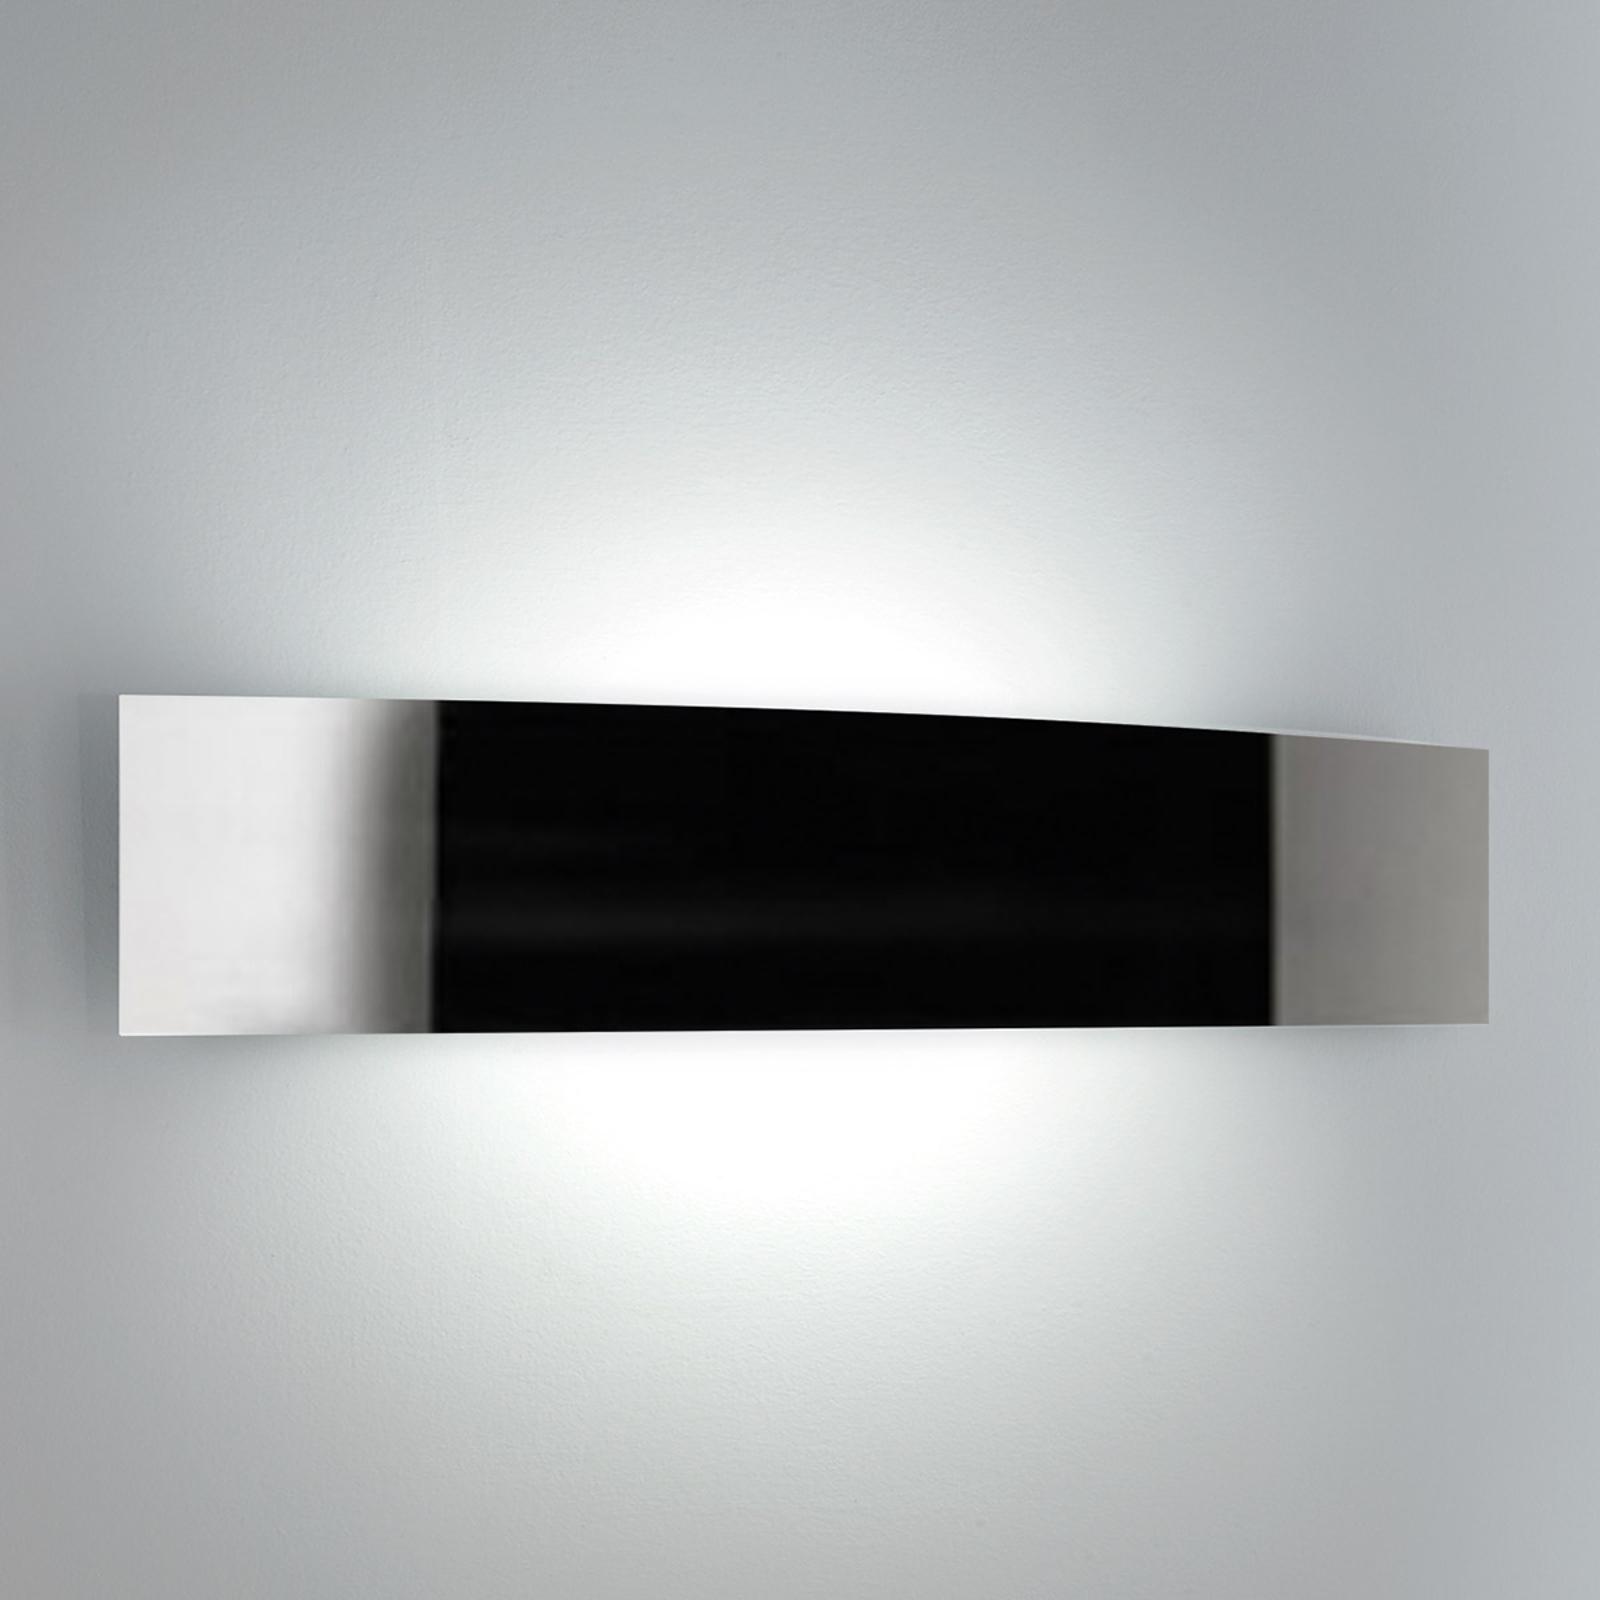 Lampa ścienna RIGA szerokość 36 cm stal szlachetna